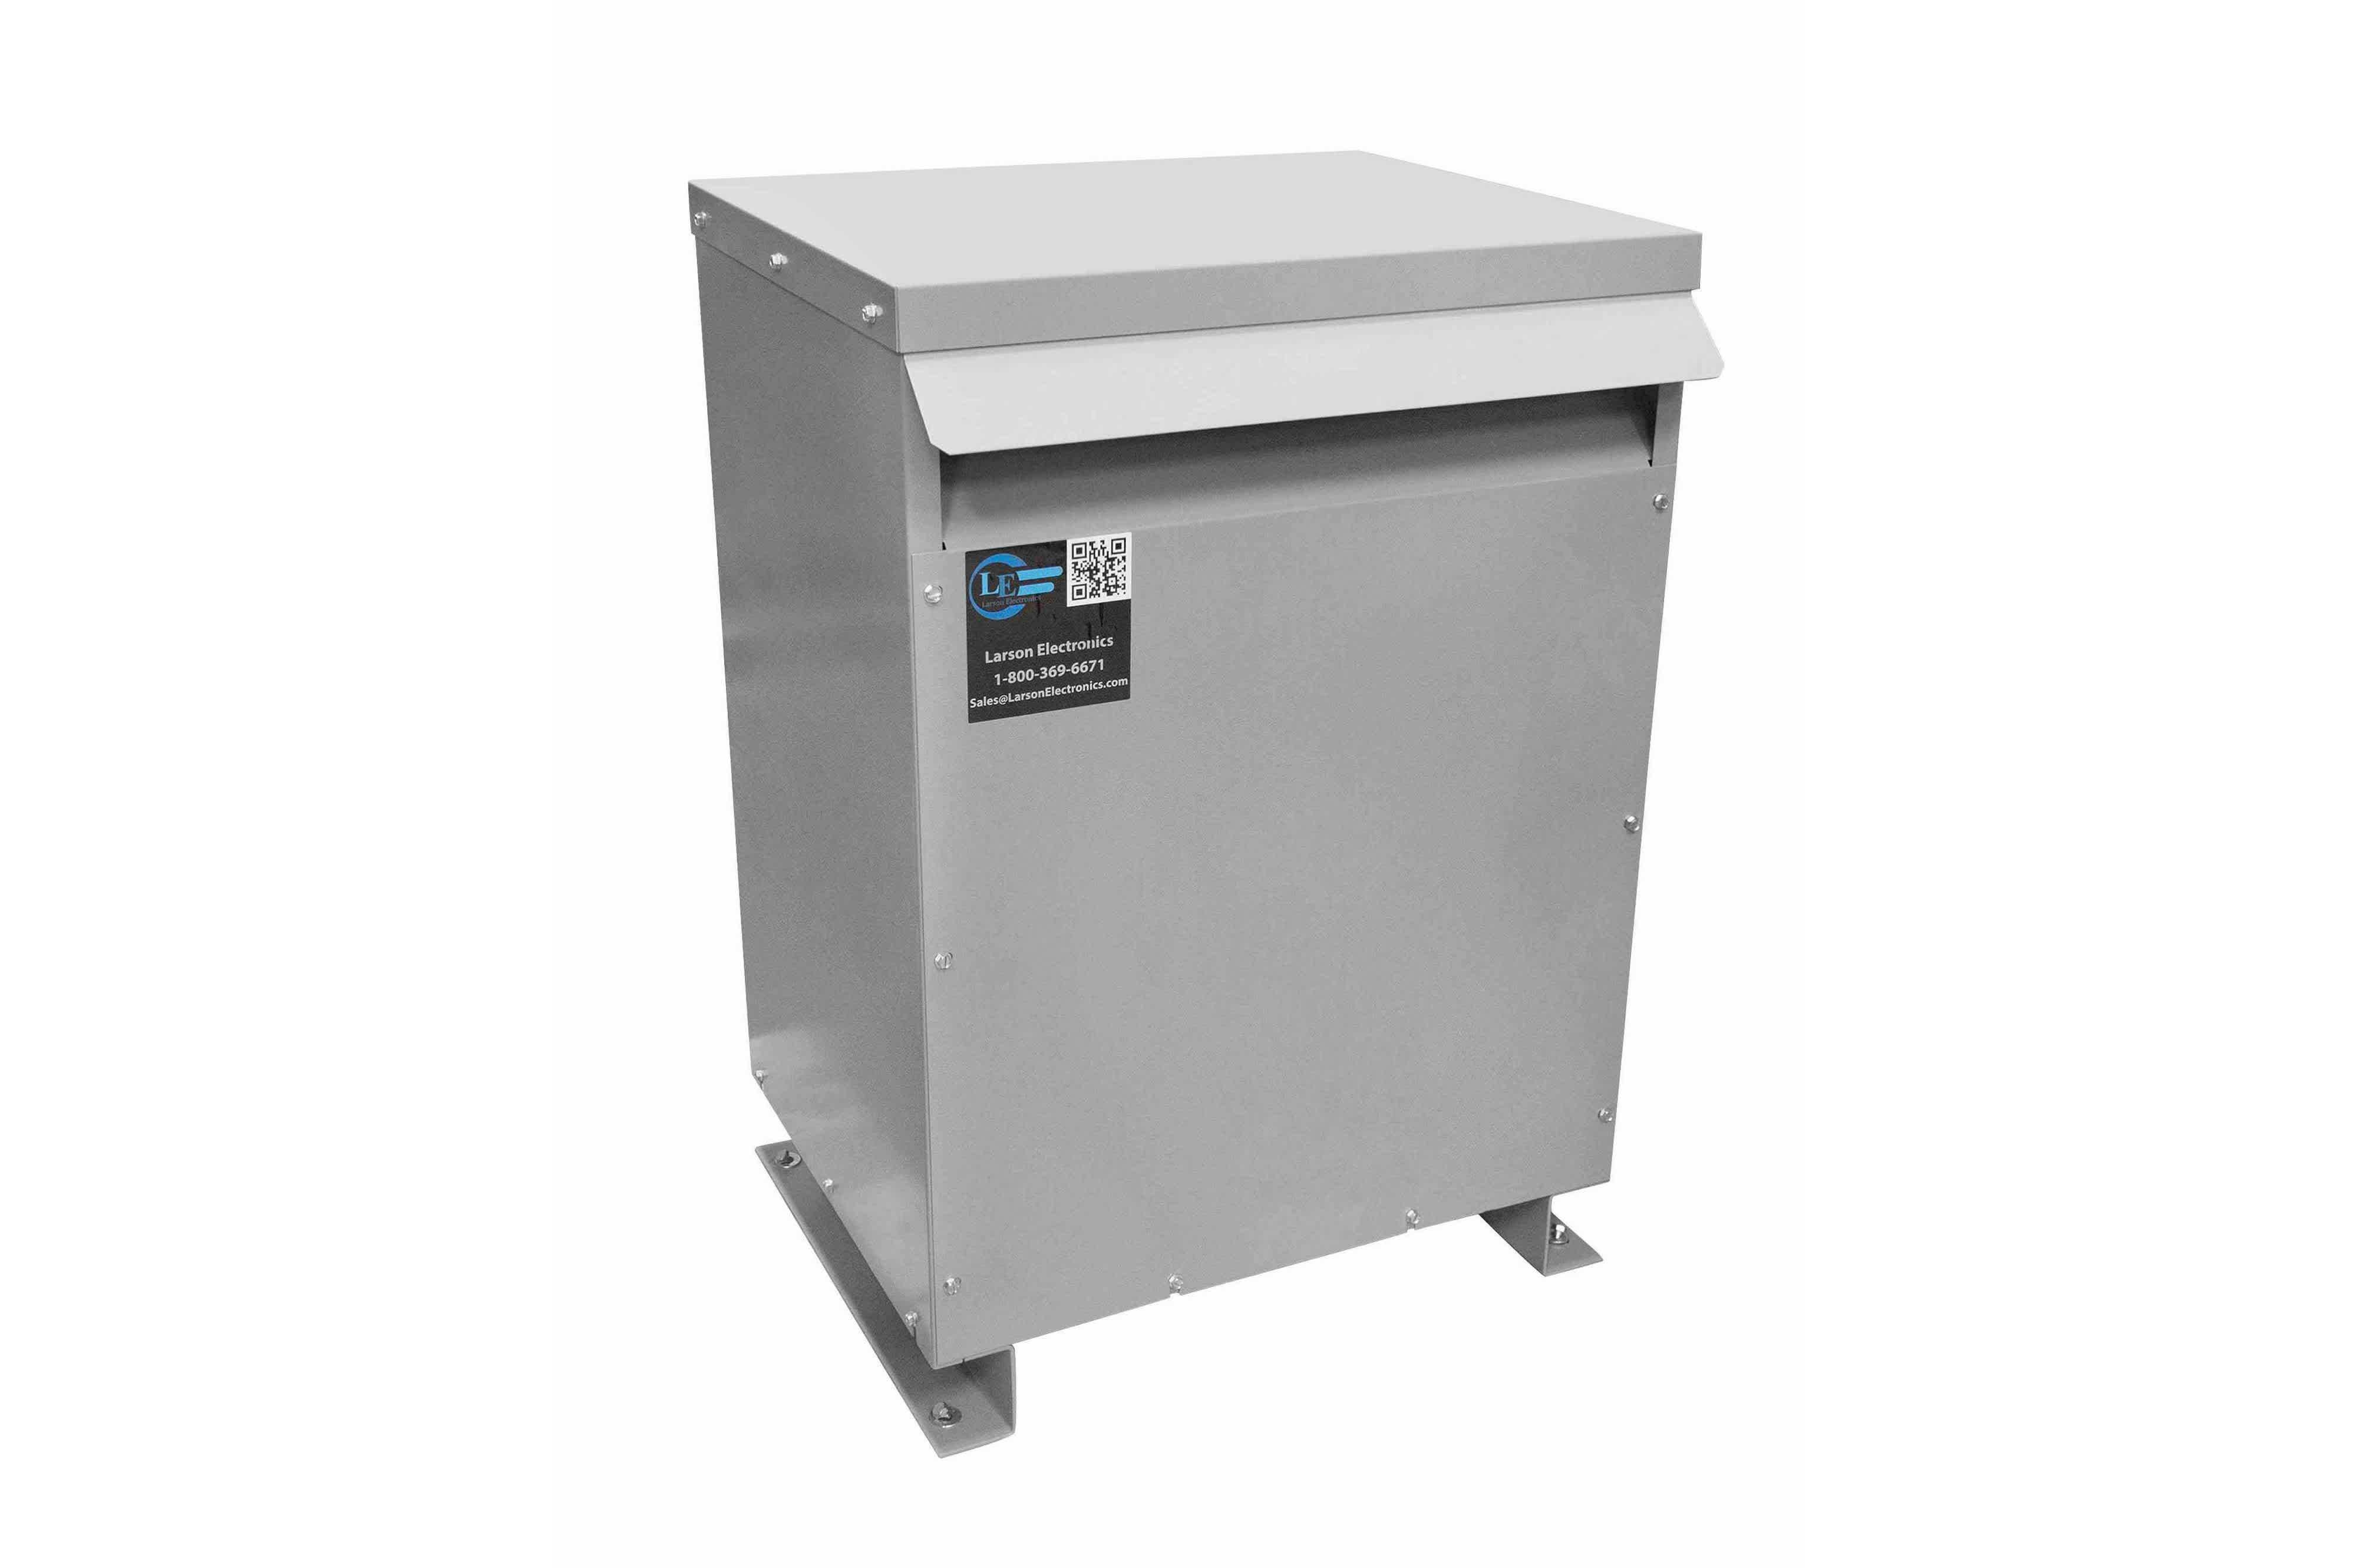 20 kVA 3PH DOE Transformer, 575V Delta Primary, 415Y/240 Wye-N Secondary, N3R, Ventilated, 60 Hz